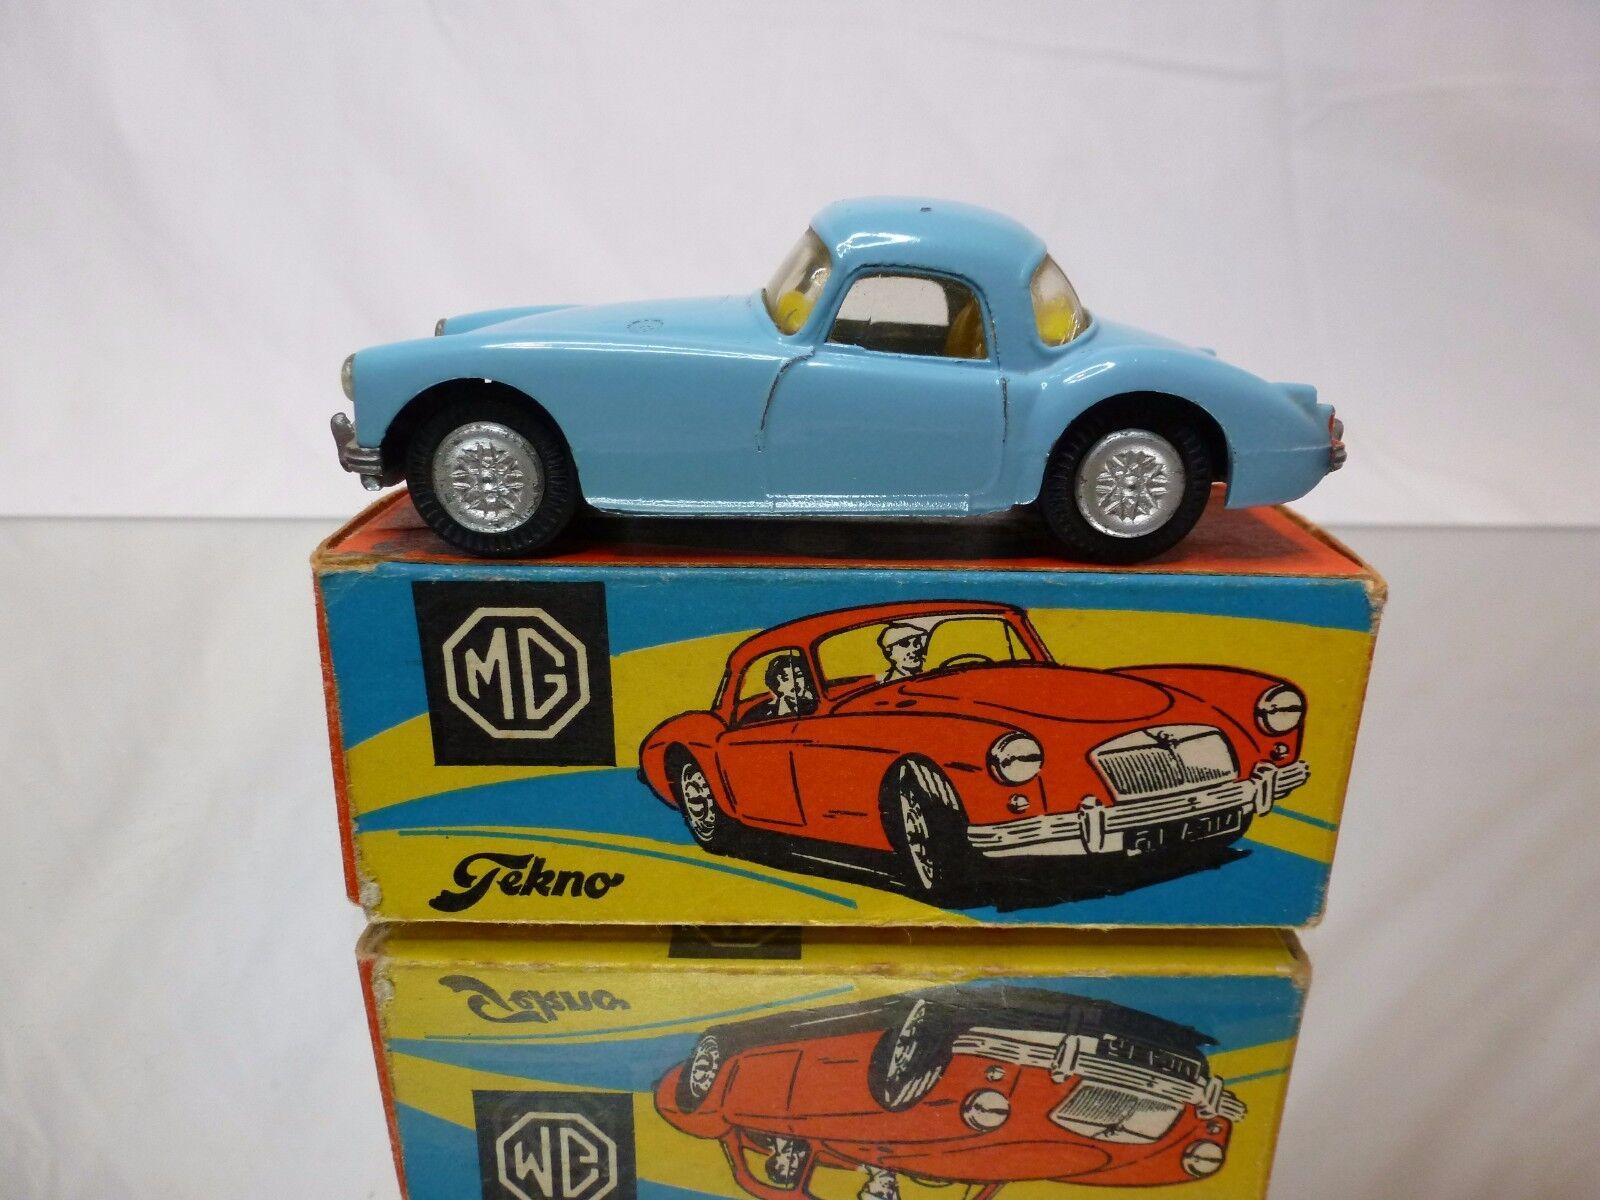 TEKNO DENMARK 824 MGA 1600 1600 1600 - PALE blueE 1 43 RARE - VERY GOOD CONDITION IN BOX 4848c1